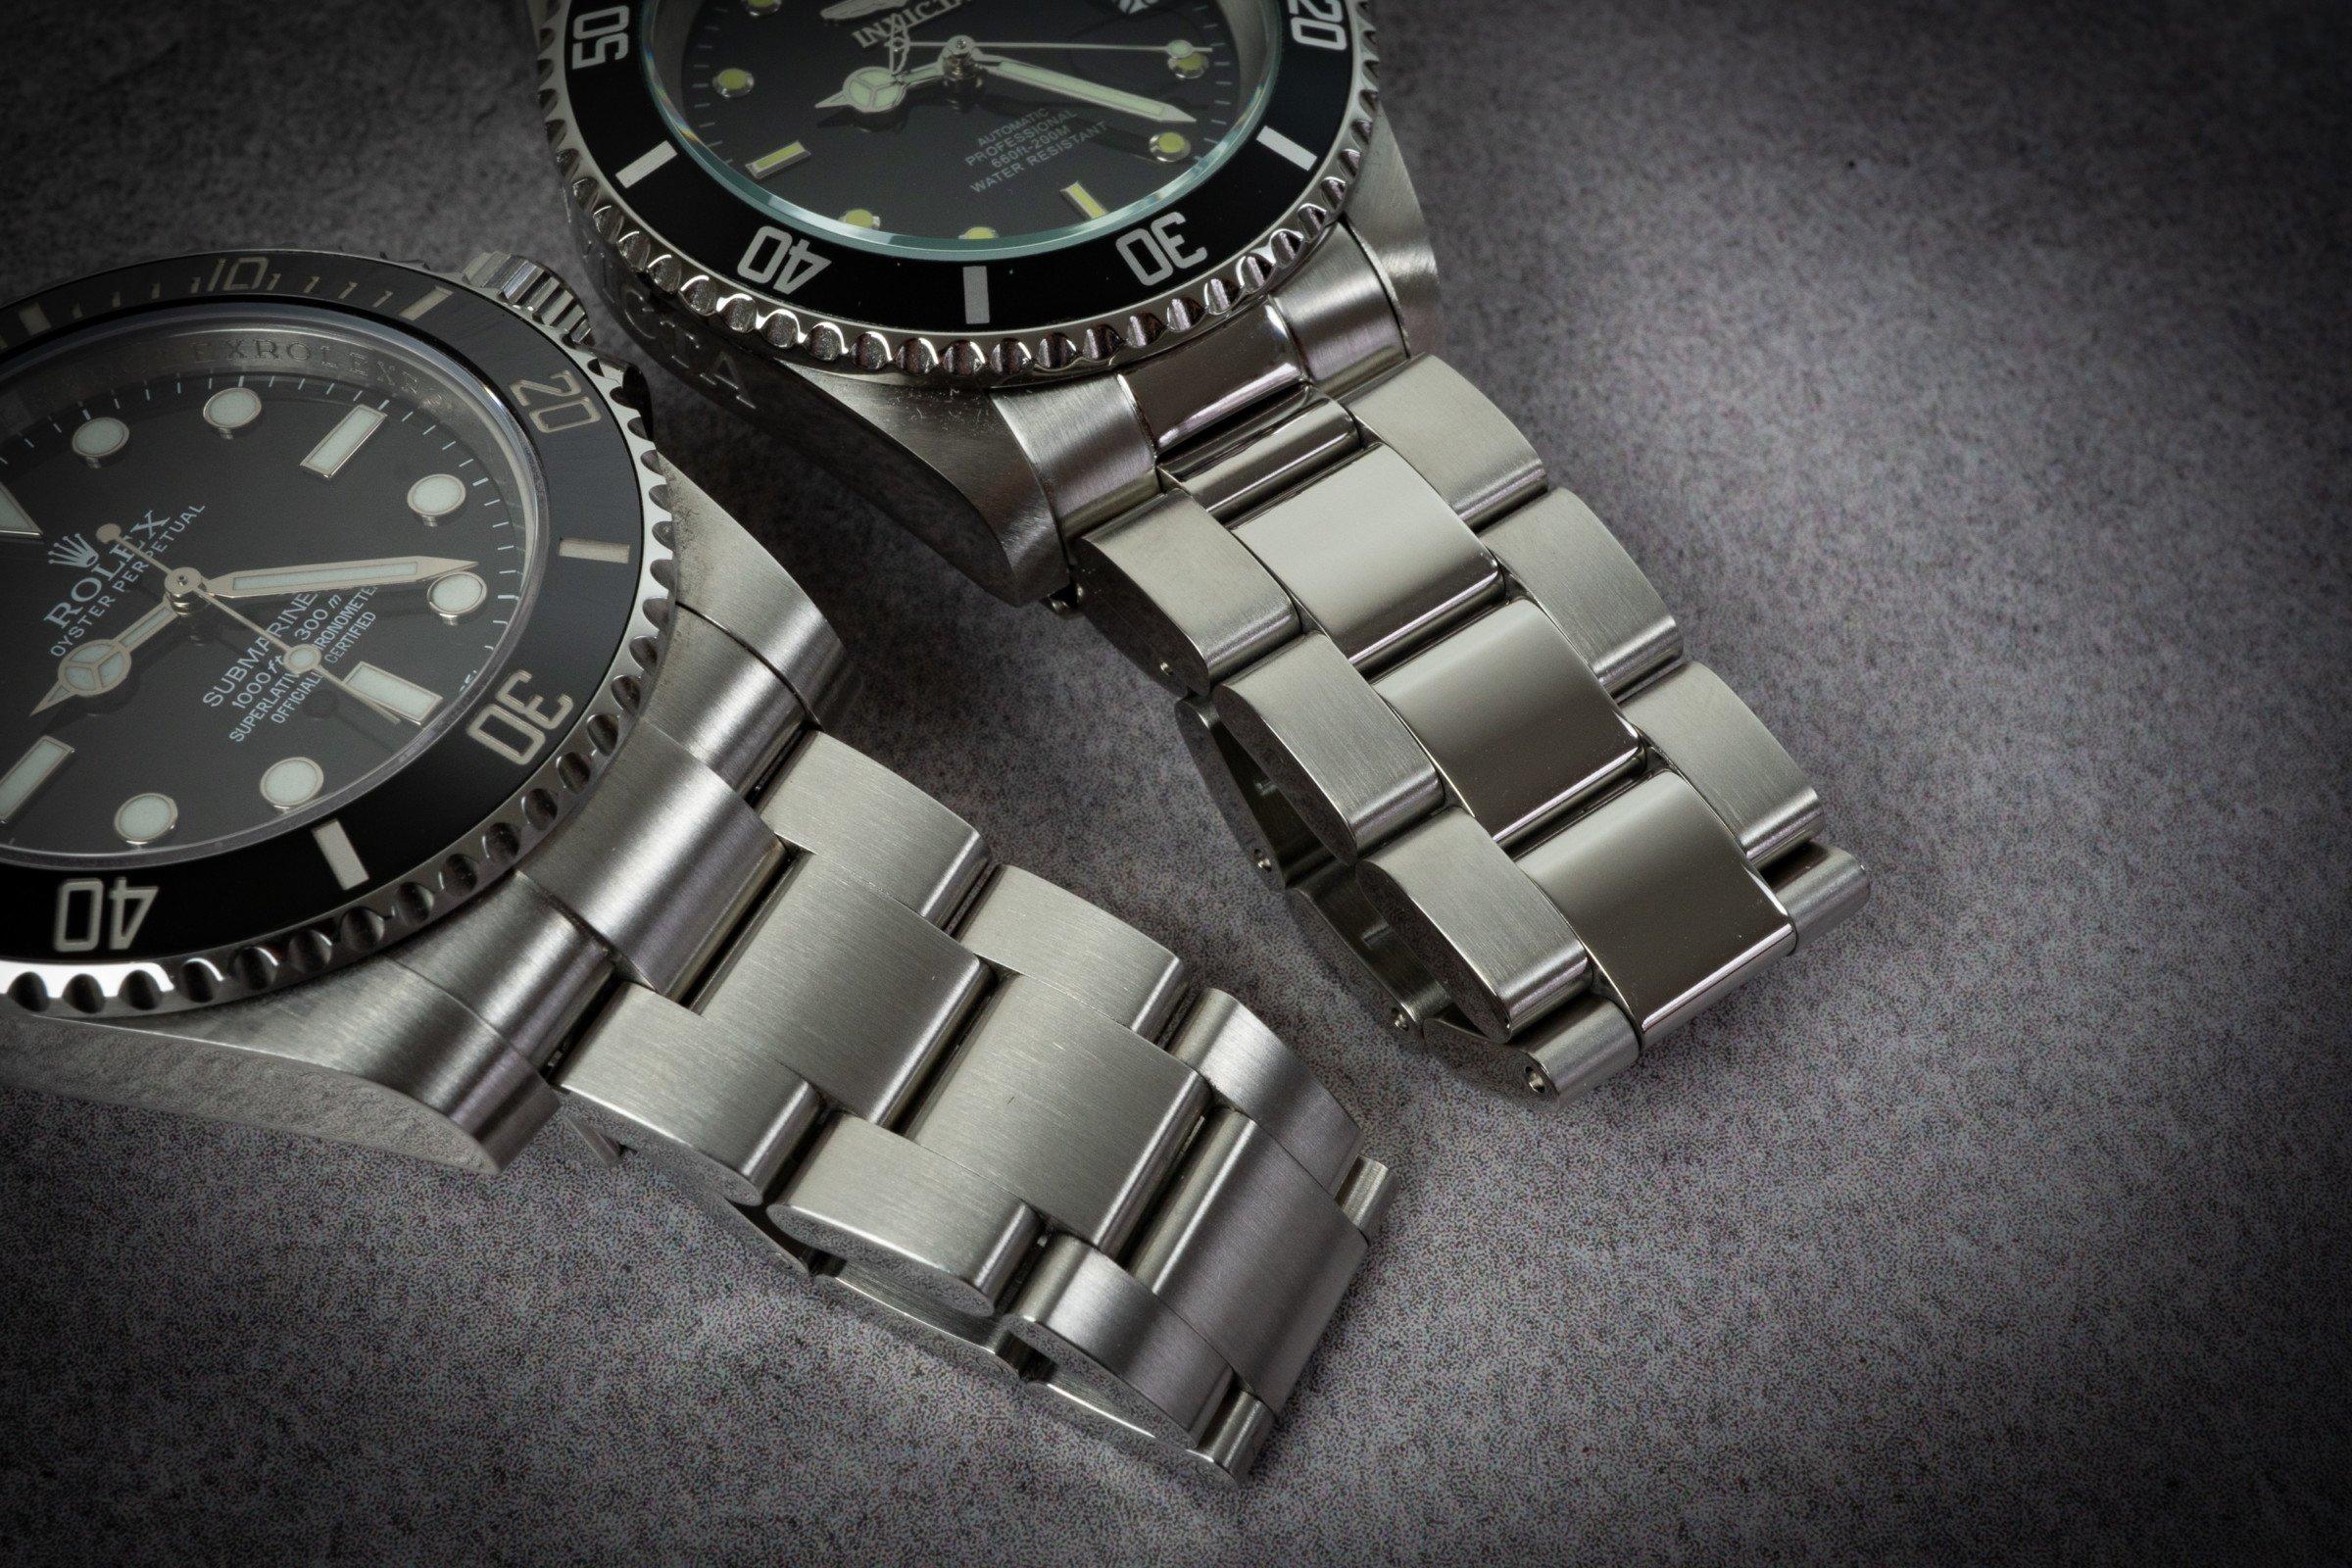 Invicta 8926OB Pro Diver Vergleich Rolex Submariner